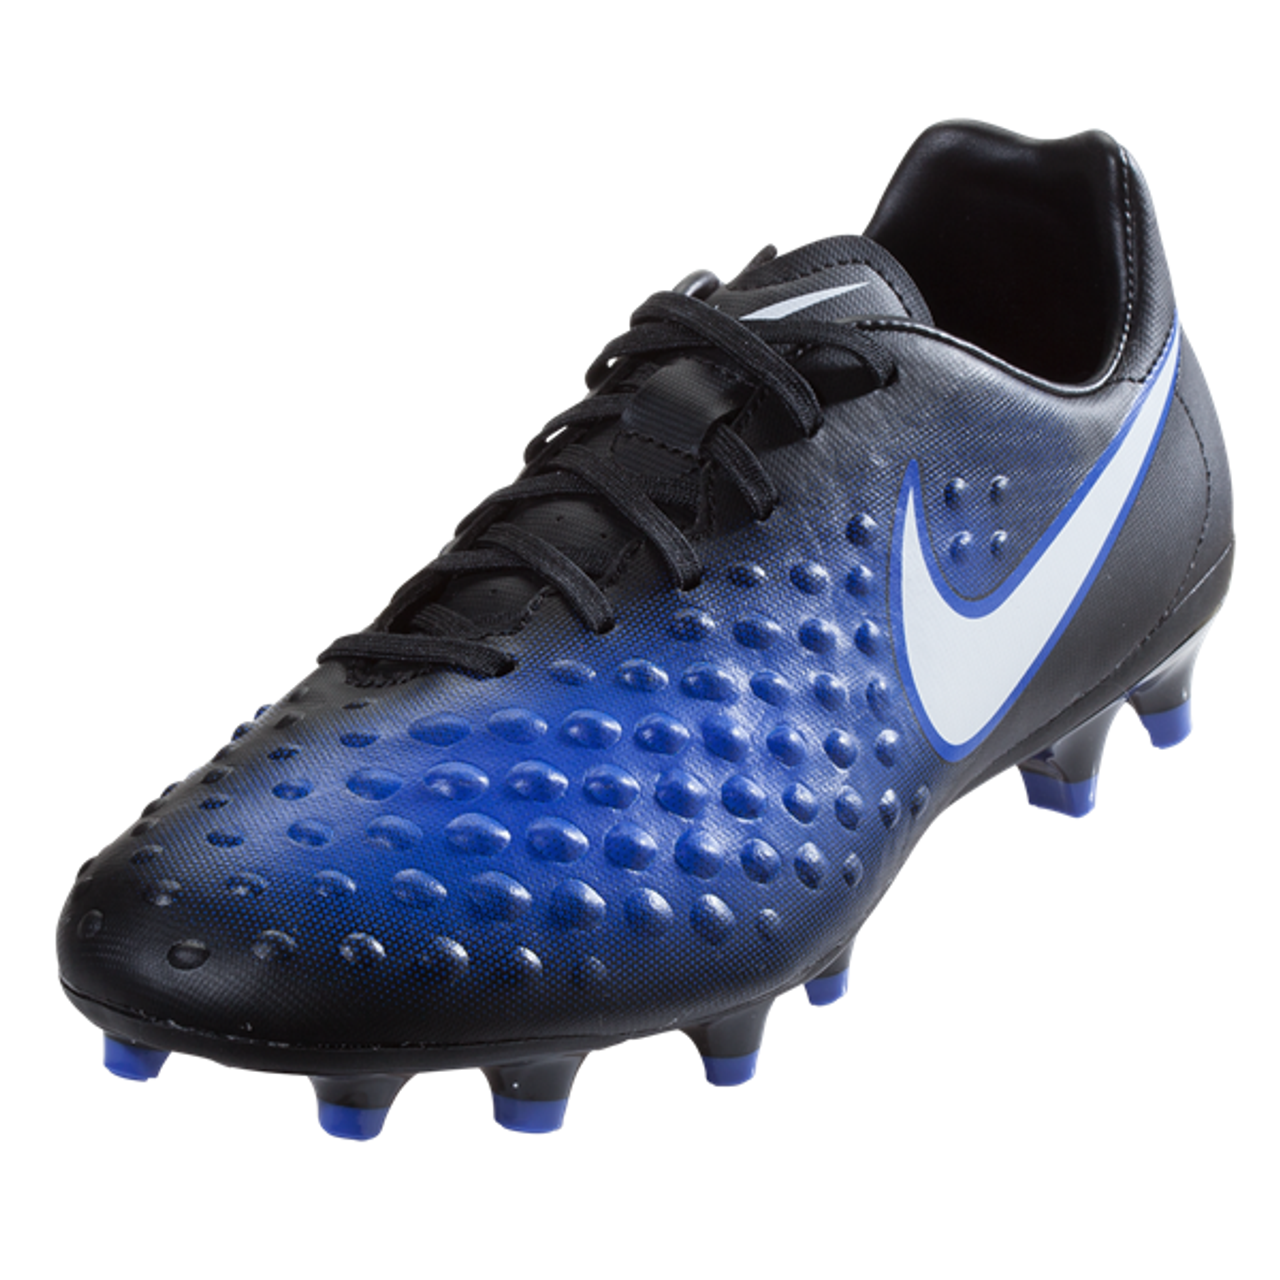 best website b4c8a 340b5 SKU  844411 015 11. Nike Magista Onda II FG - Black White Paramount Blue  (111617)